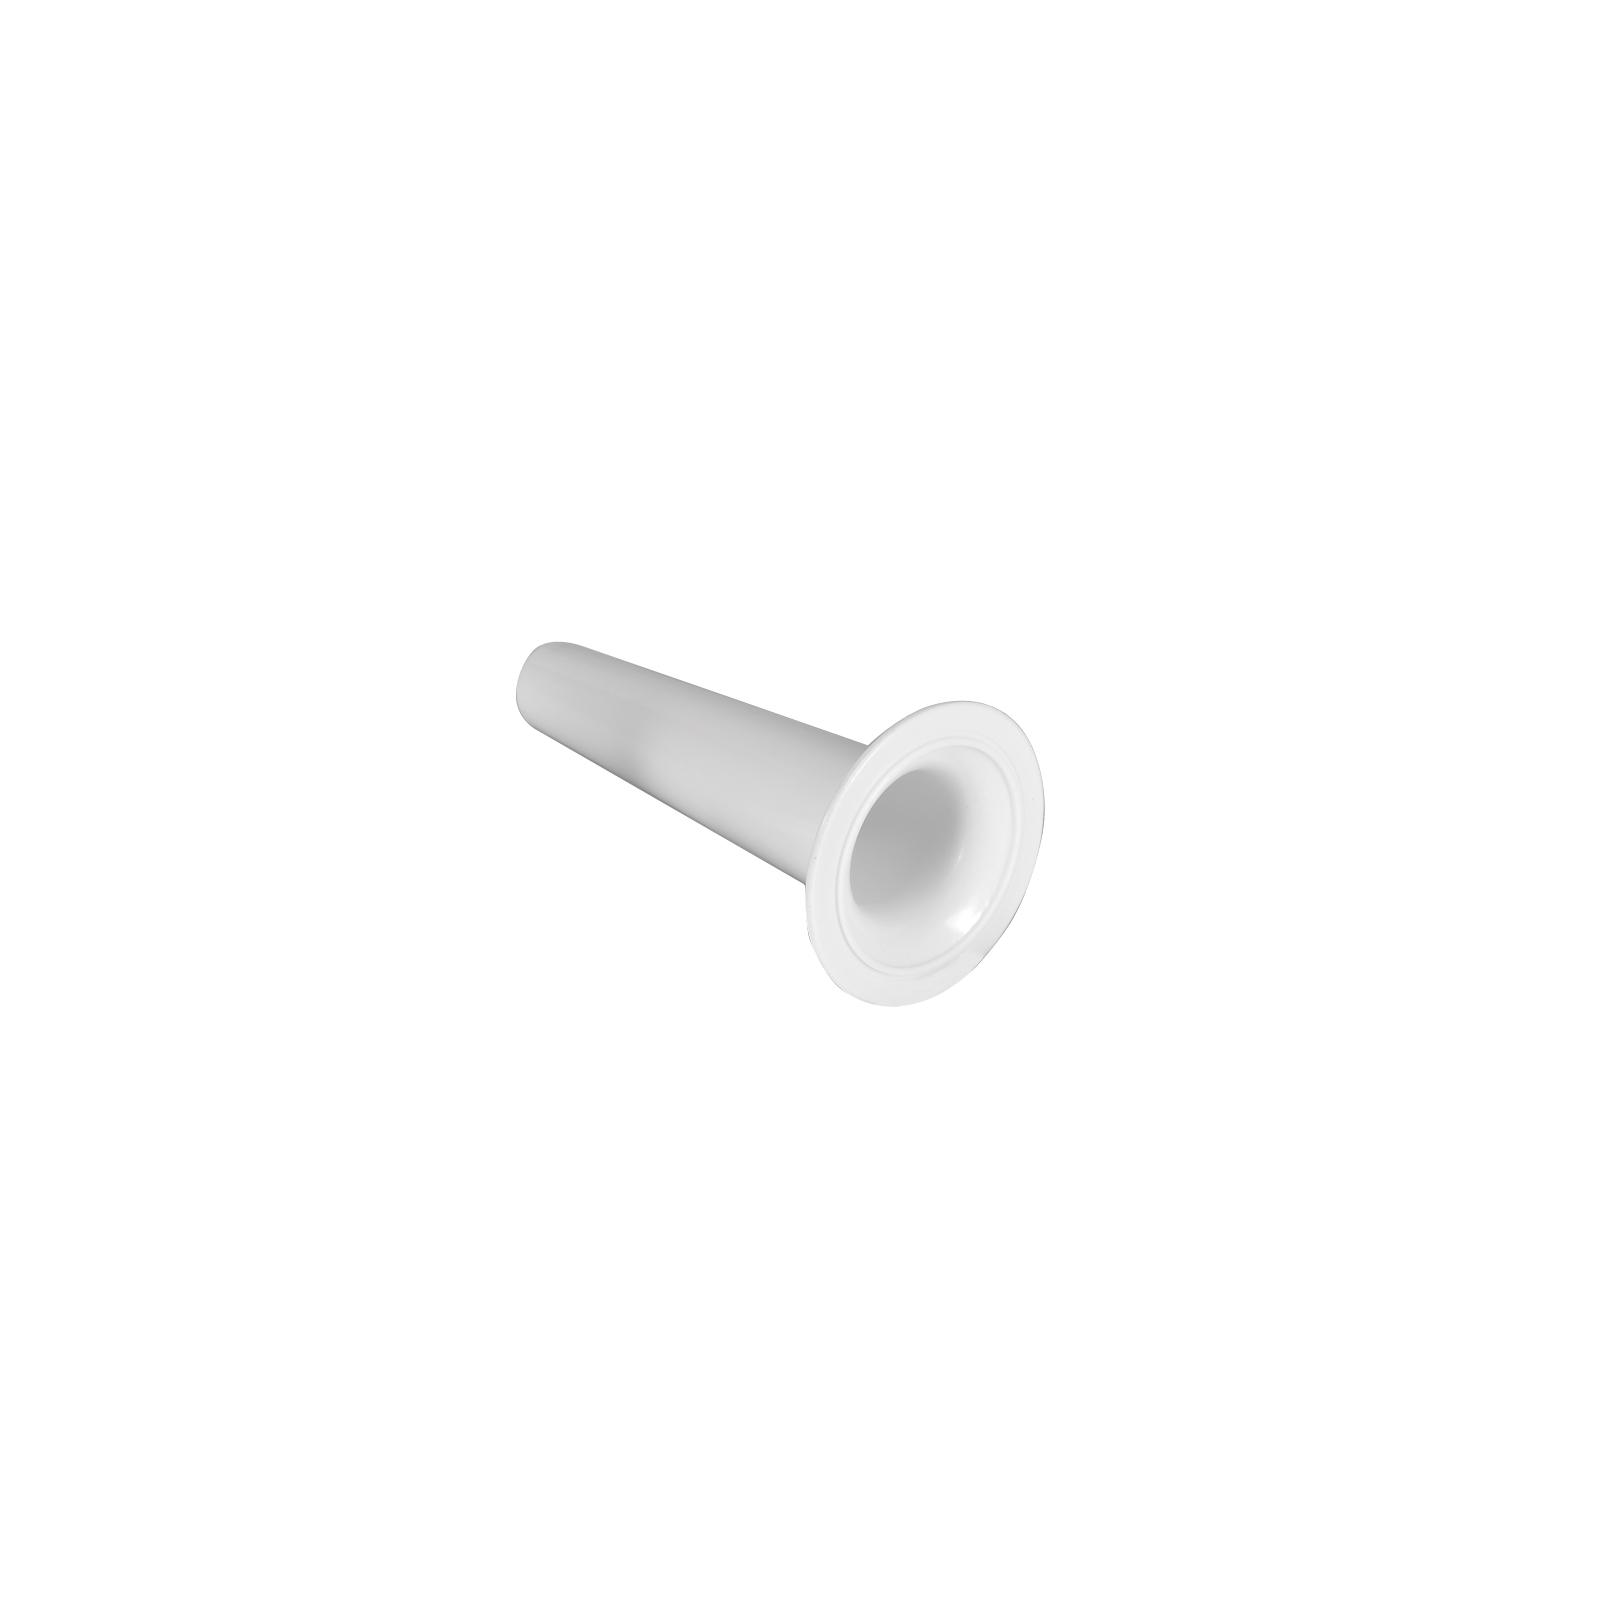 Мясорубка REDMOND RMG-1205-8 White изображение 6